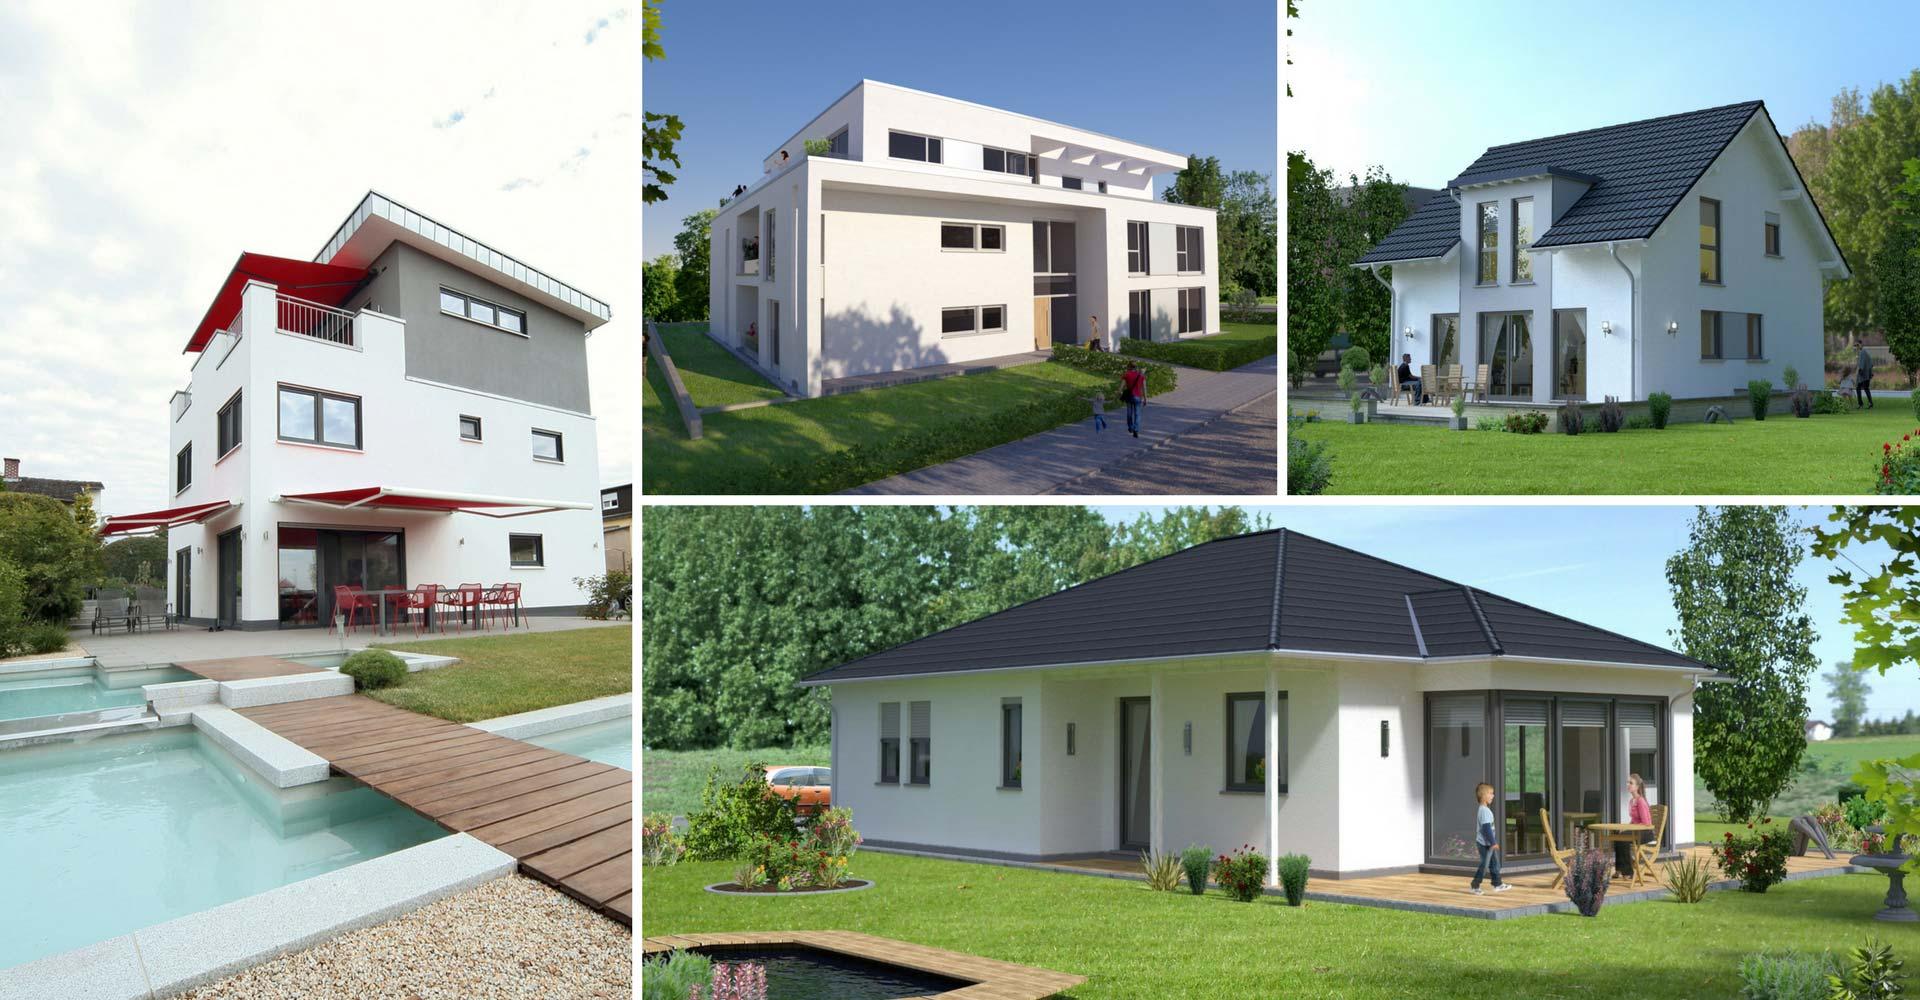 massivhaus bauen zenz massivhaus. Black Bedroom Furniture Sets. Home Design Ideas